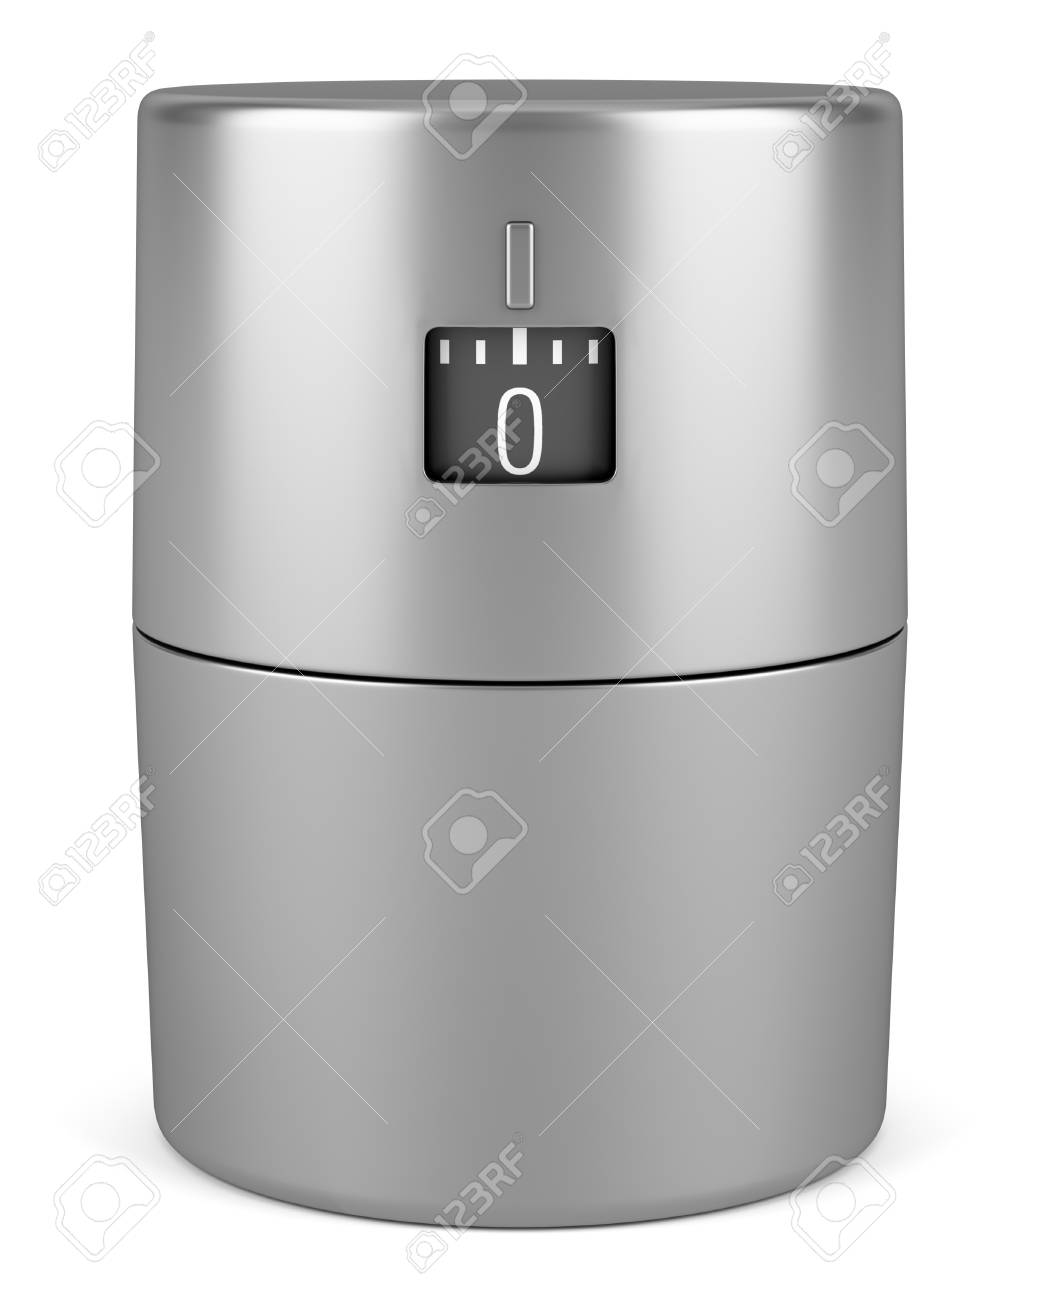 single modern metallic kitchen timer isolated on white background Stock Photo - 16606487